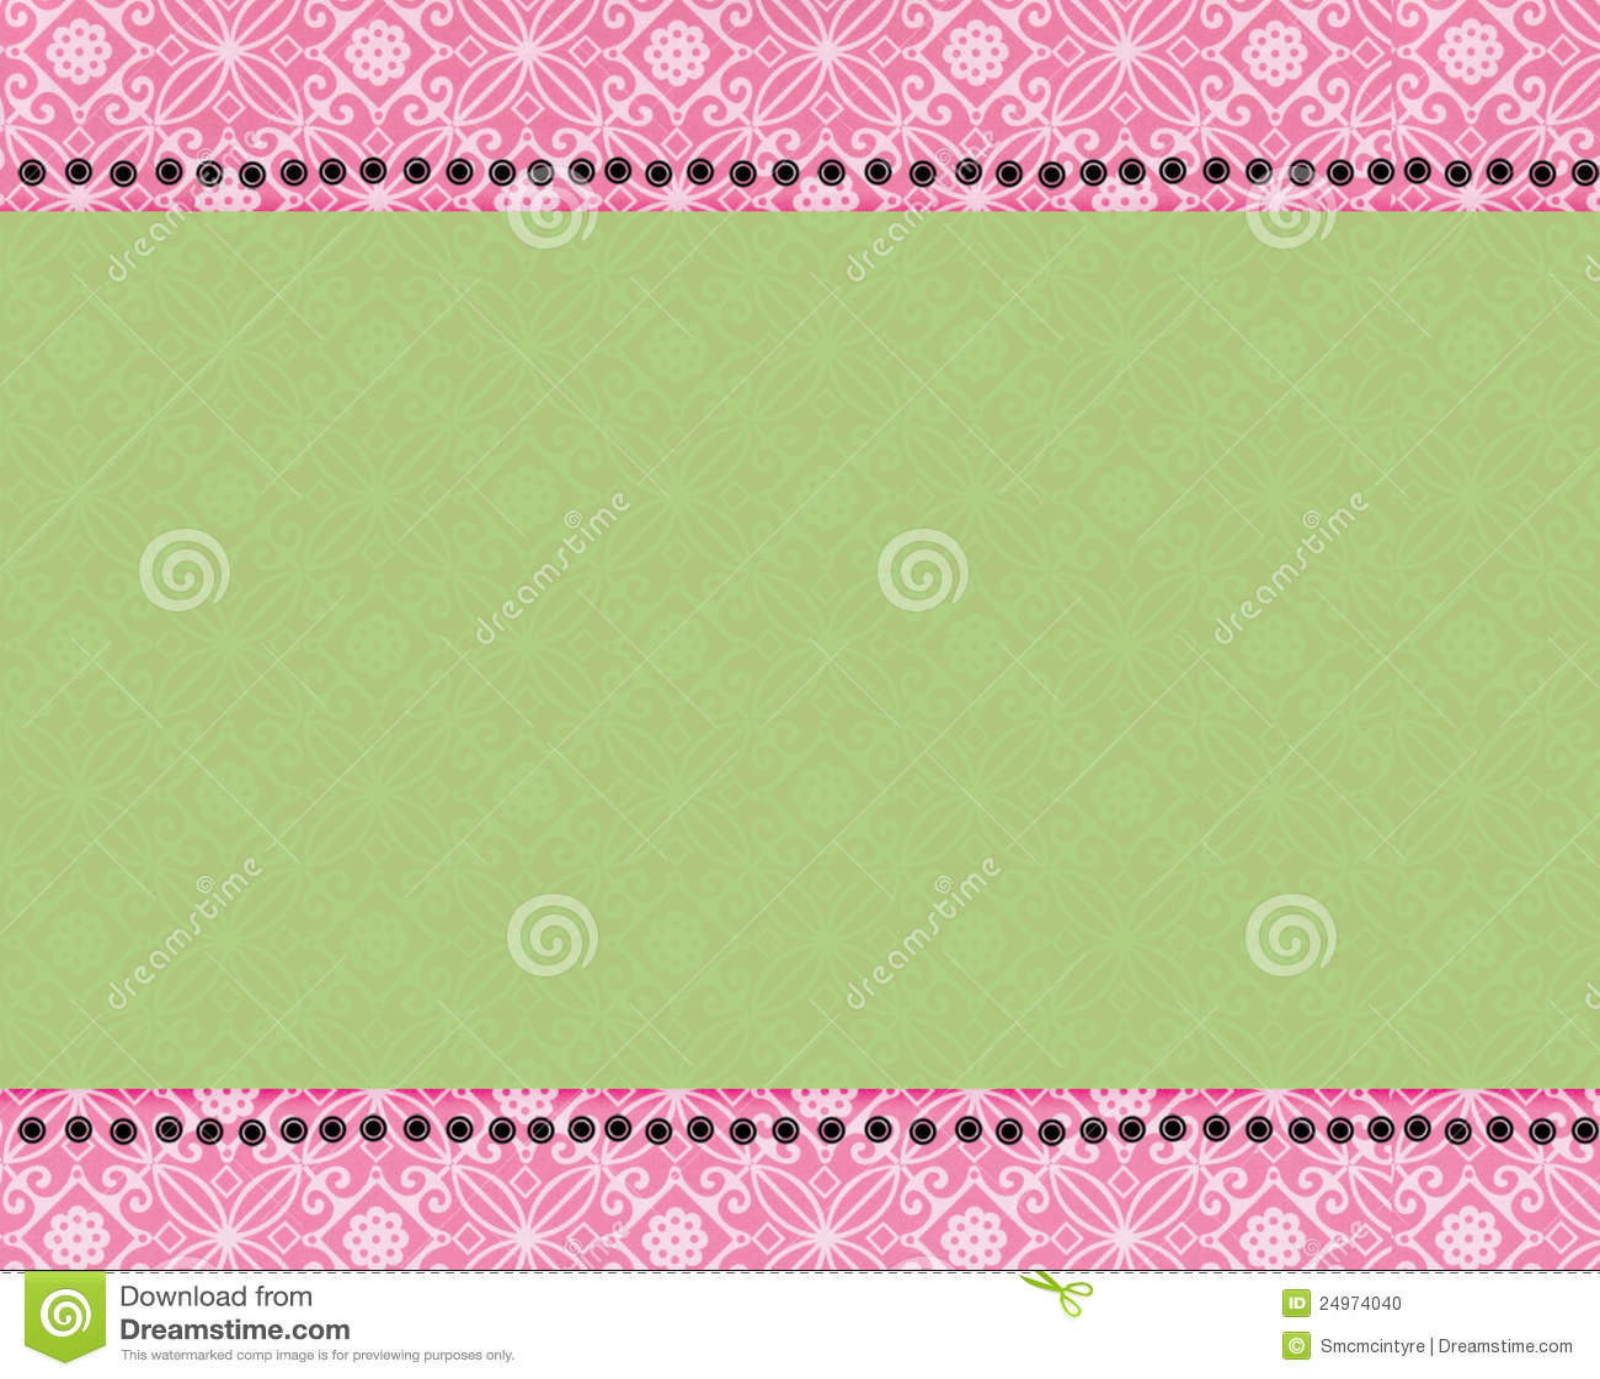 Pink And Green Paisley Print Stock Photo Image 24974040